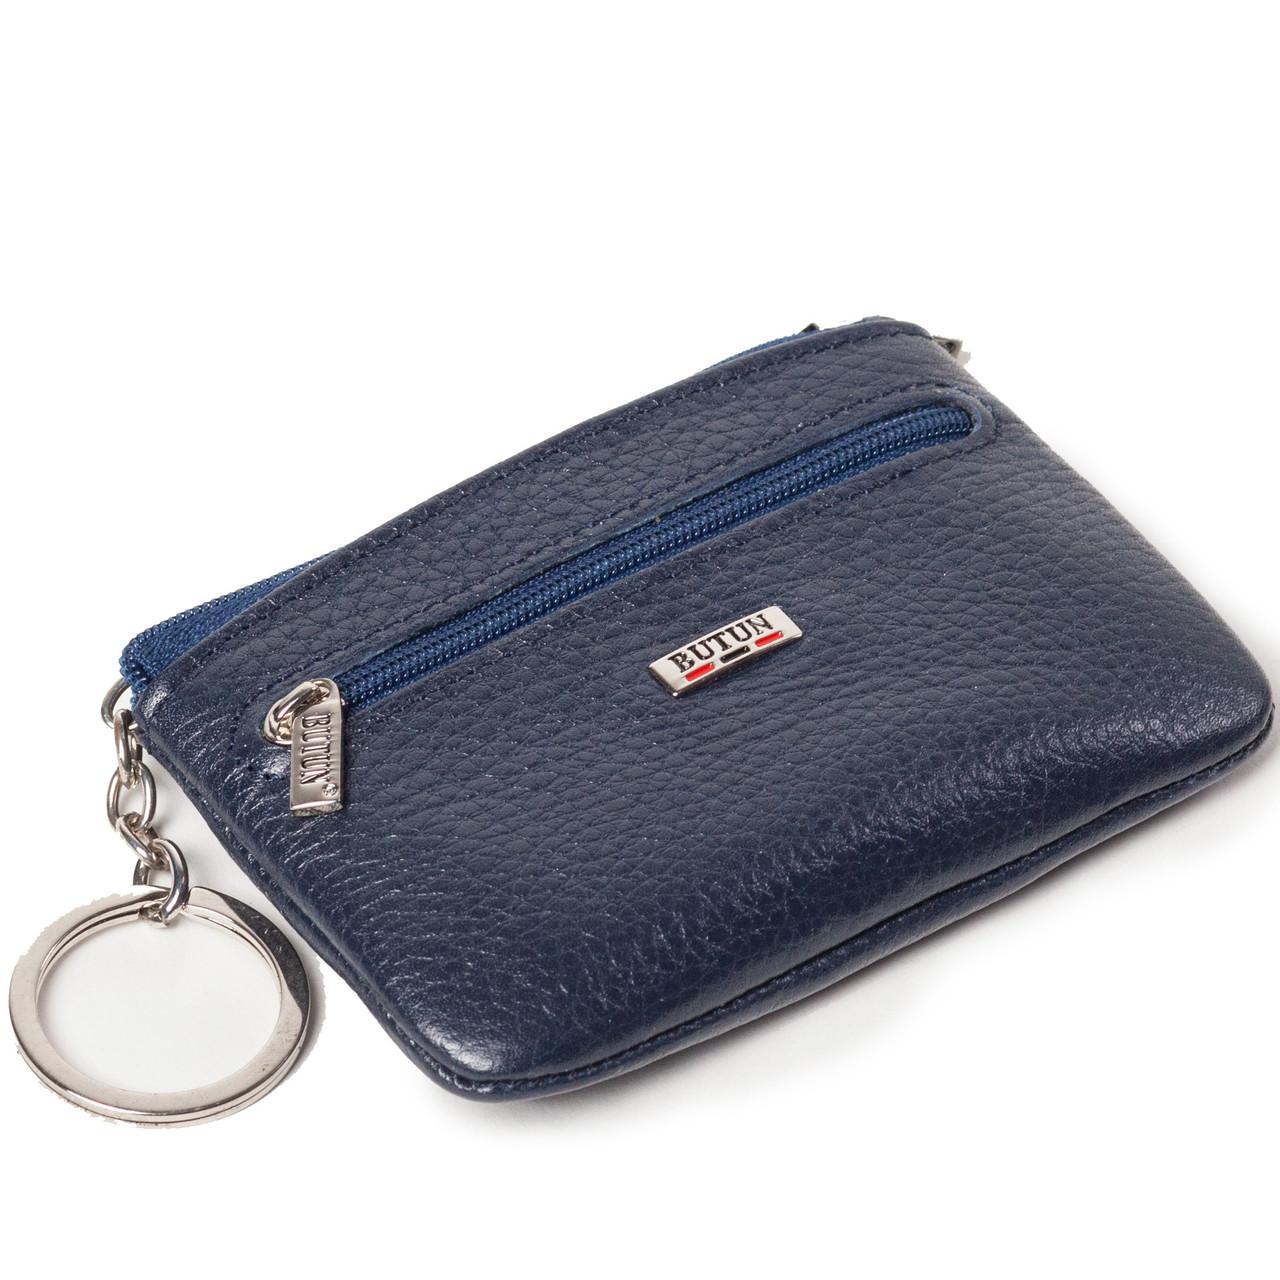 Ключница кожаная синяя Butun 761-004-034